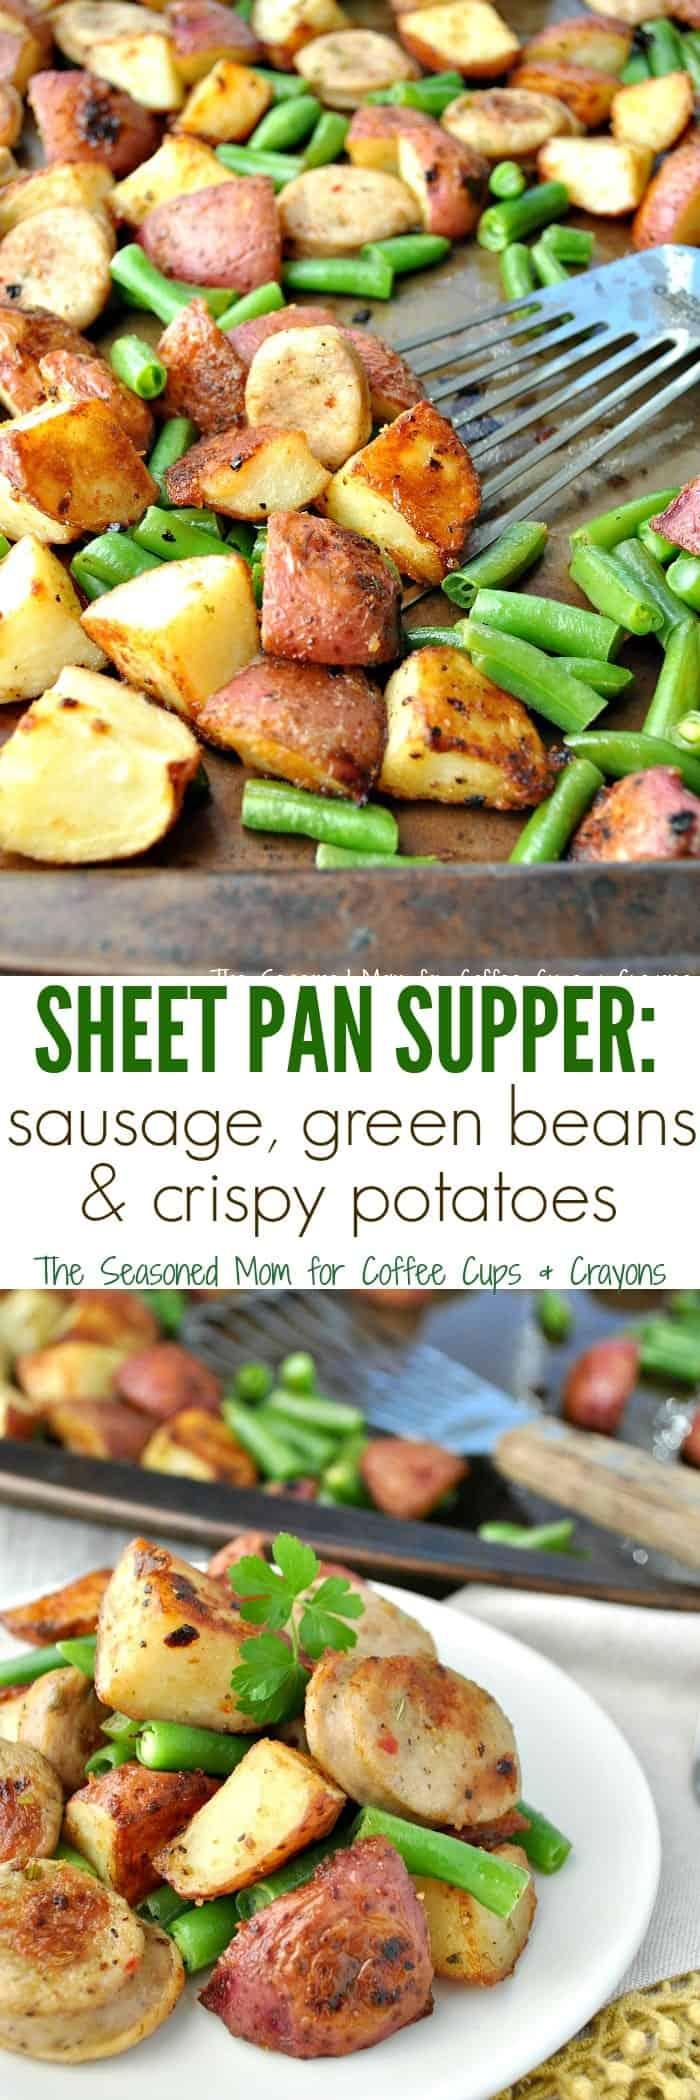 Sheet Pan Supper Sausage Potato Green Beans